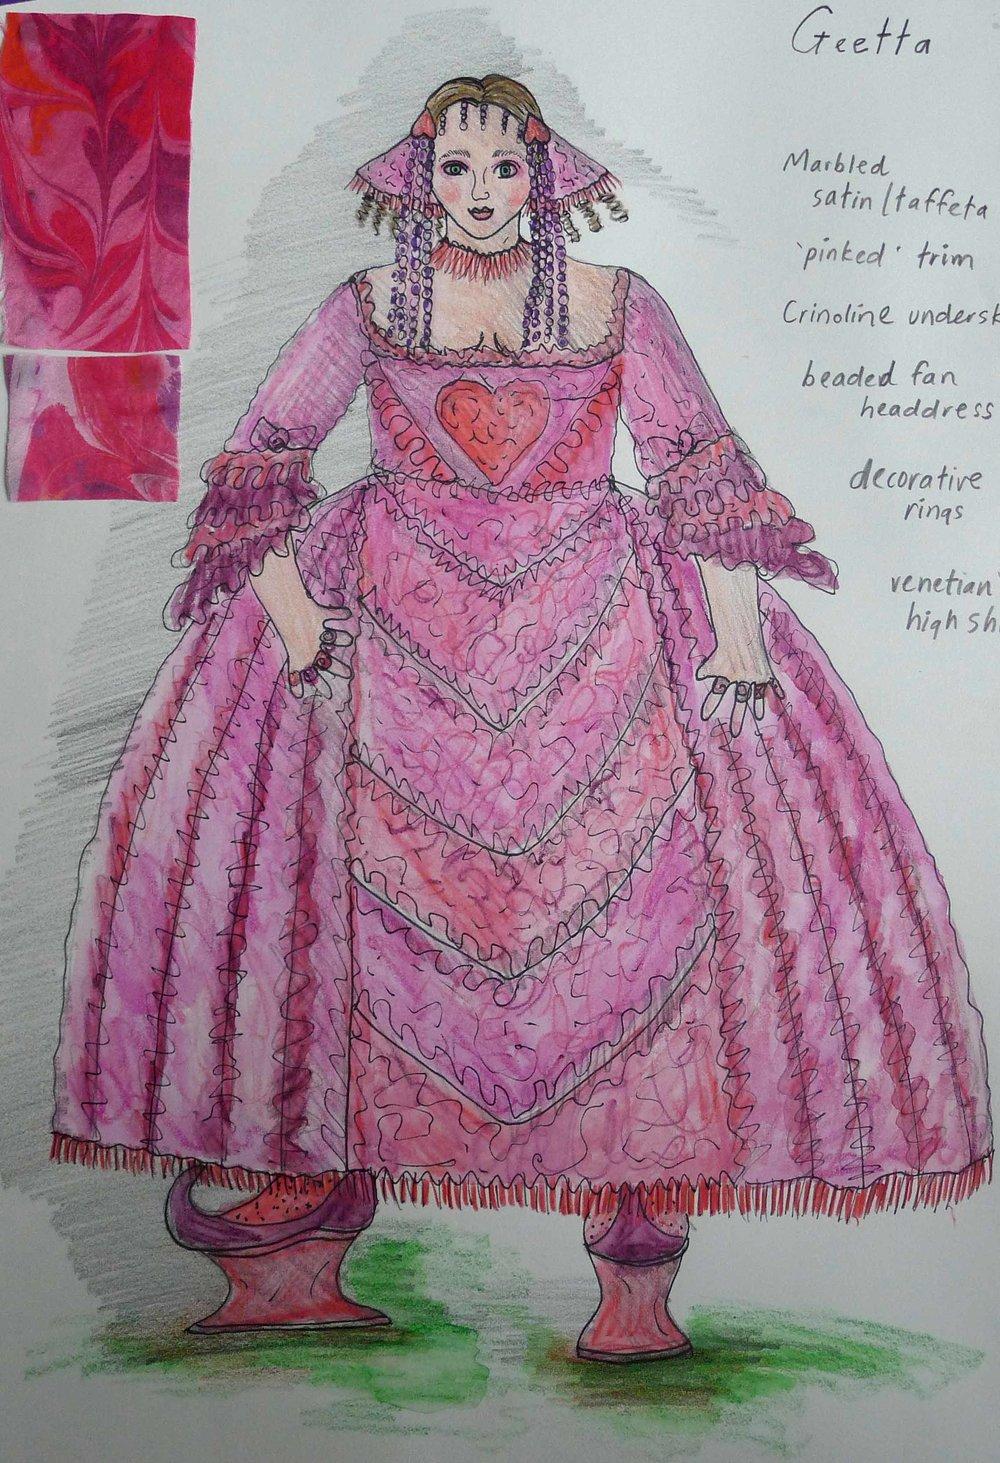 Geetta costume drawing